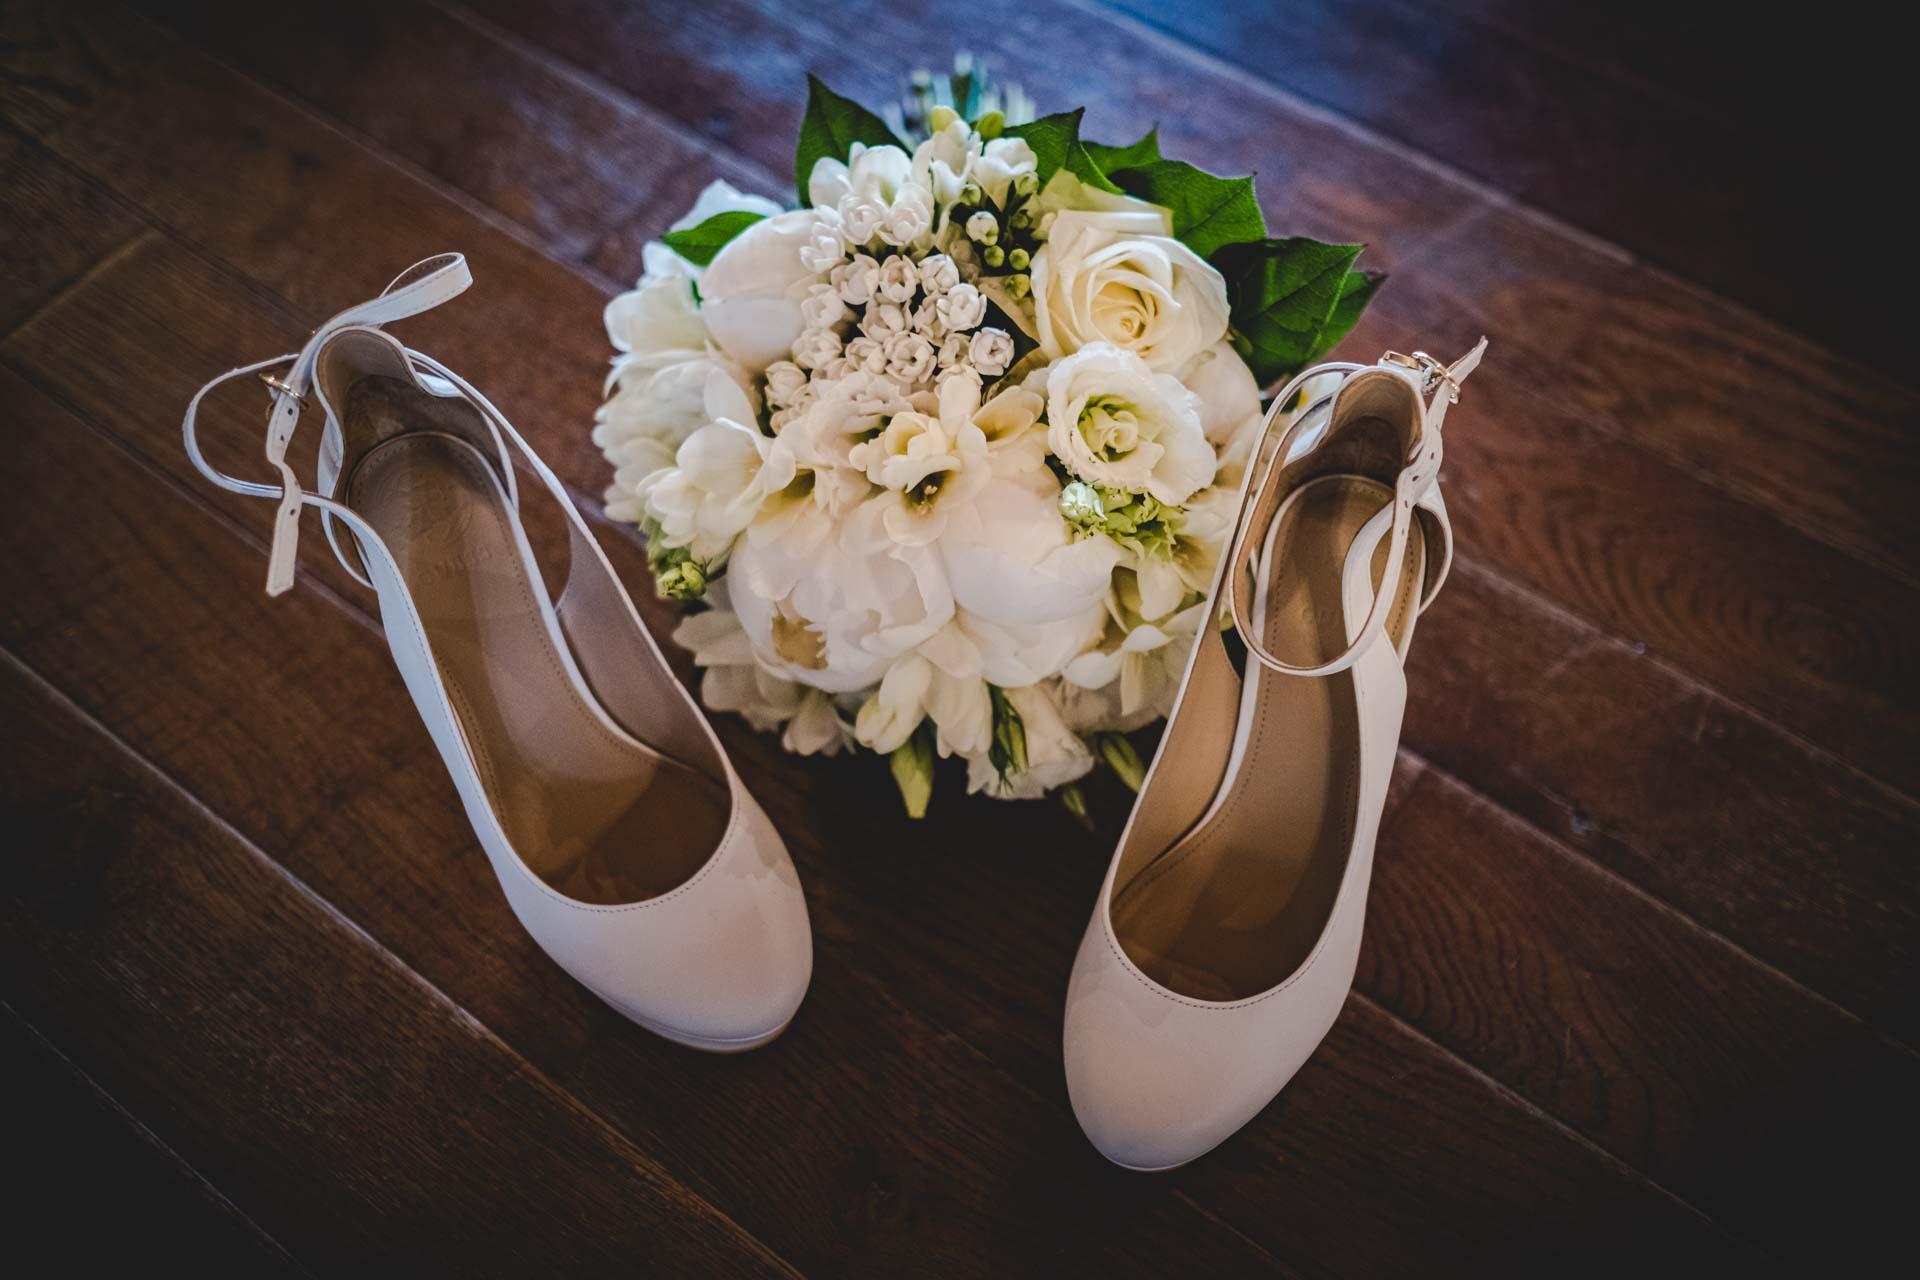 matrimonio particolare scarpe sposa bouquet